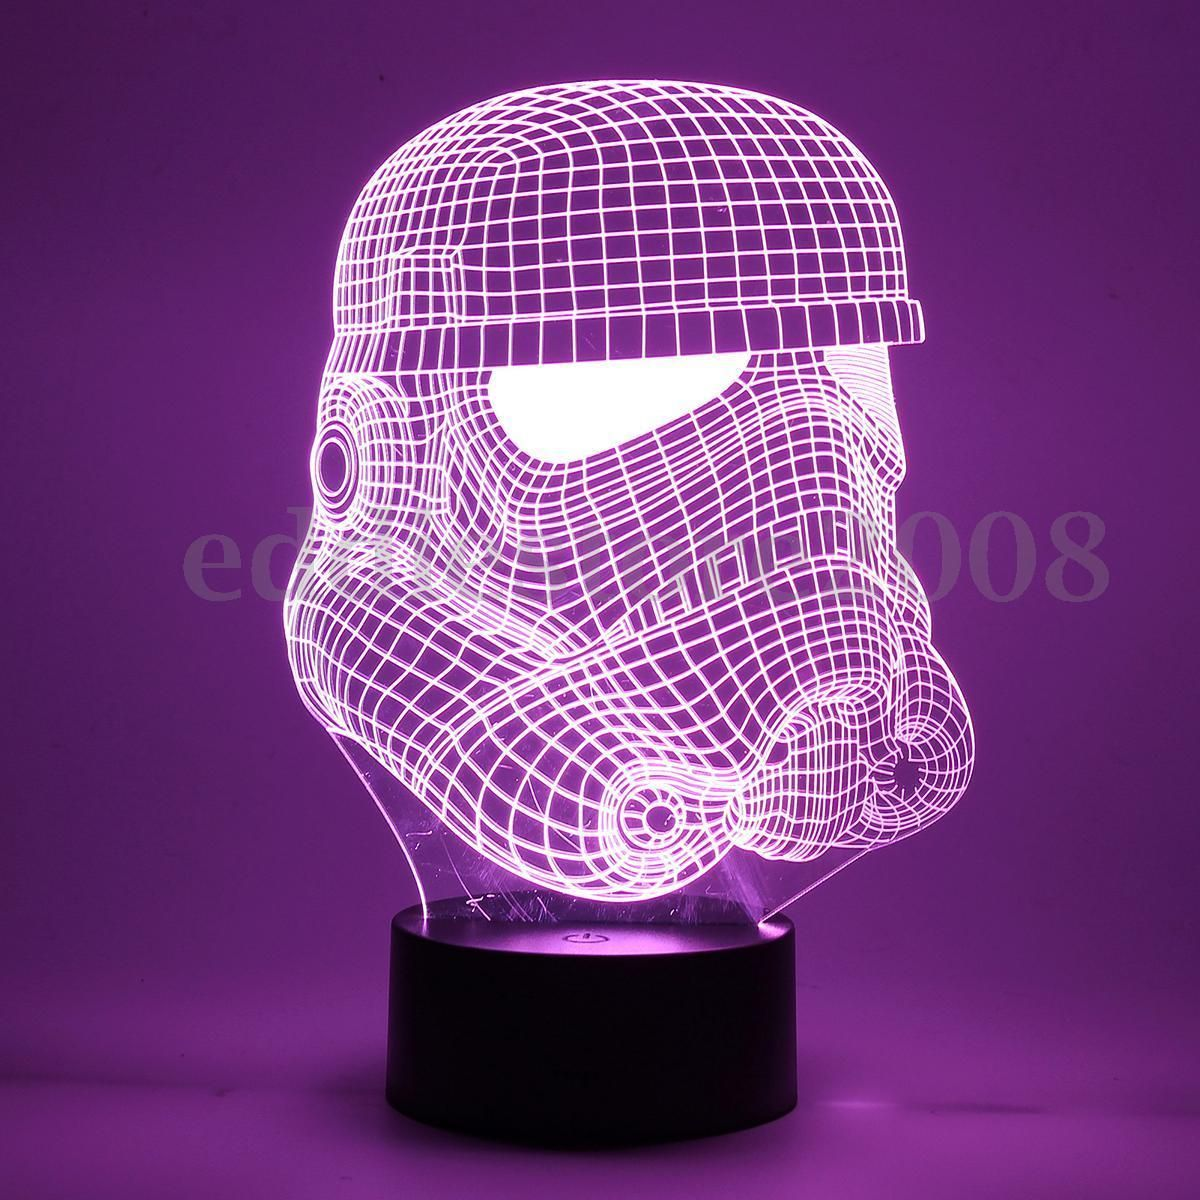 Led night light kickstarter - 3d Touch Control Led 7 Color Changing Usb Desk Table Night Light Lamp Decor